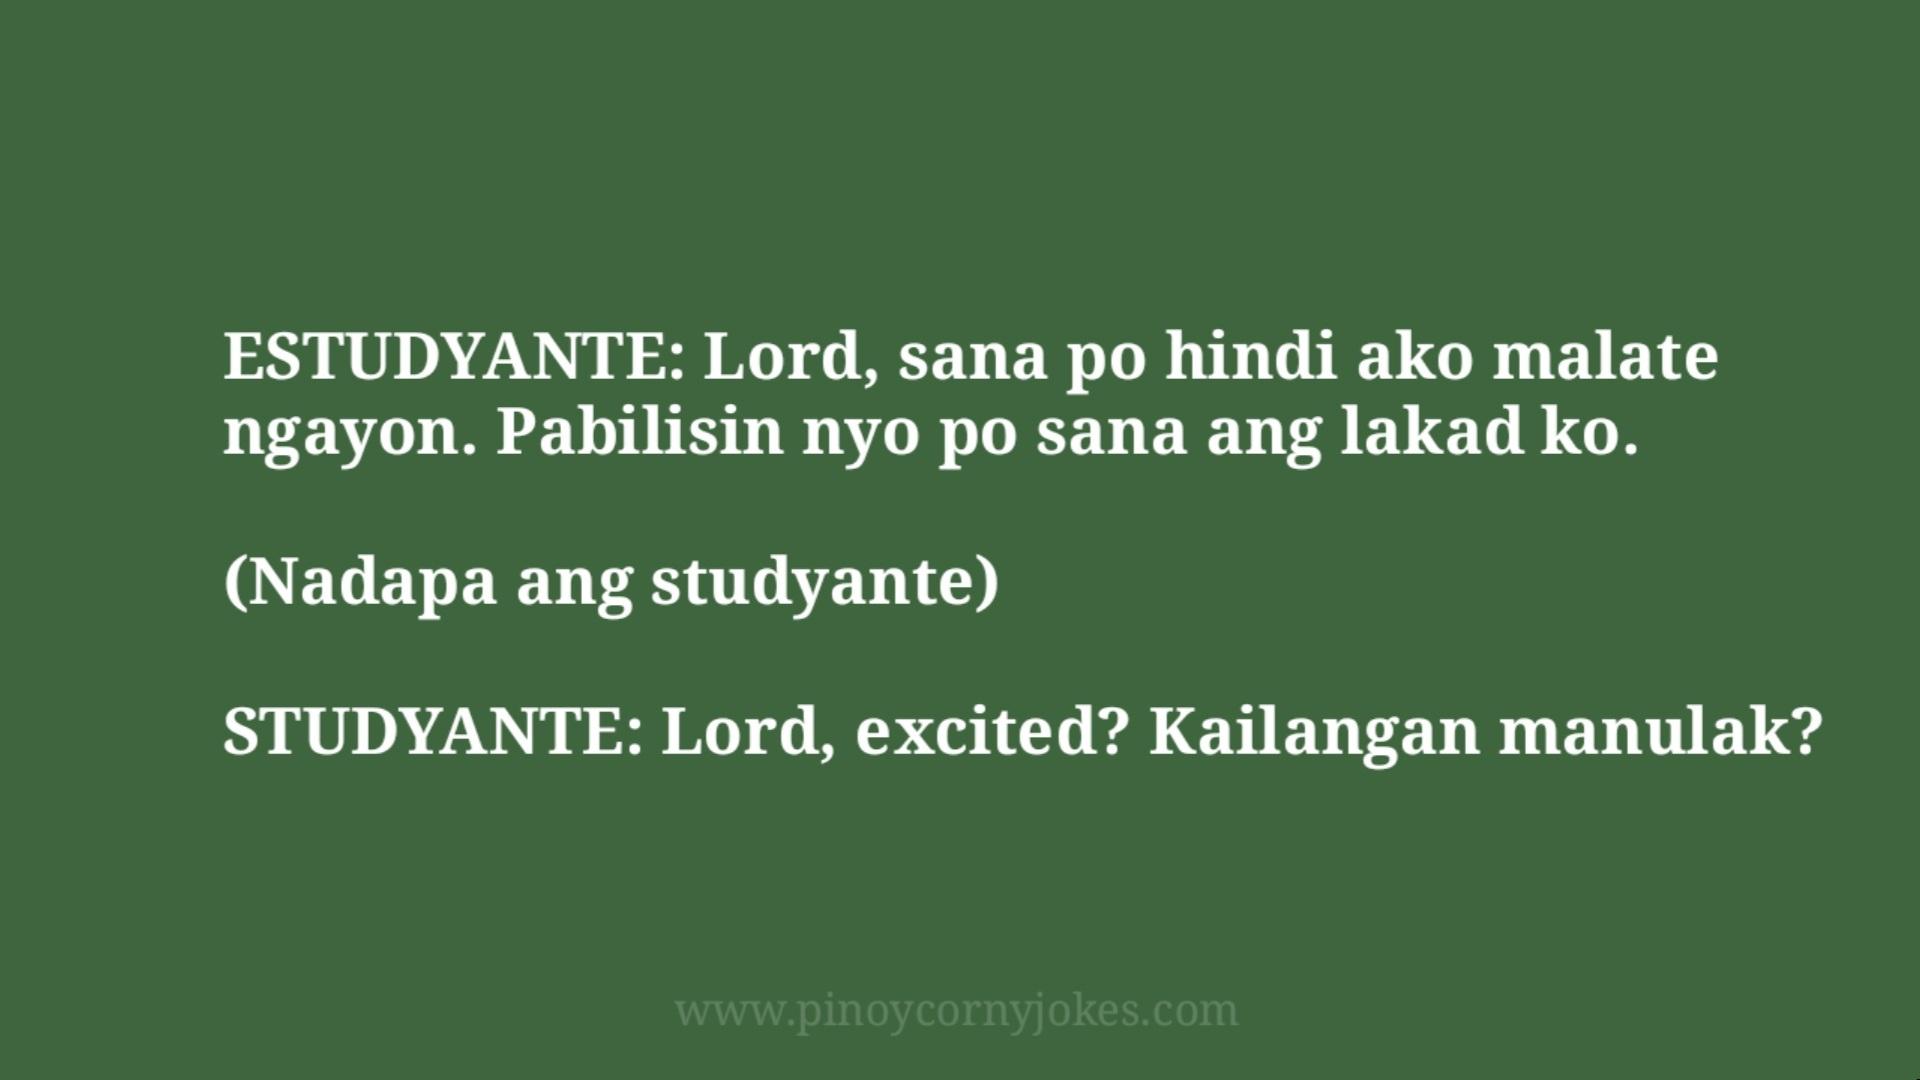 Late estudyante tagalog jokes 2021